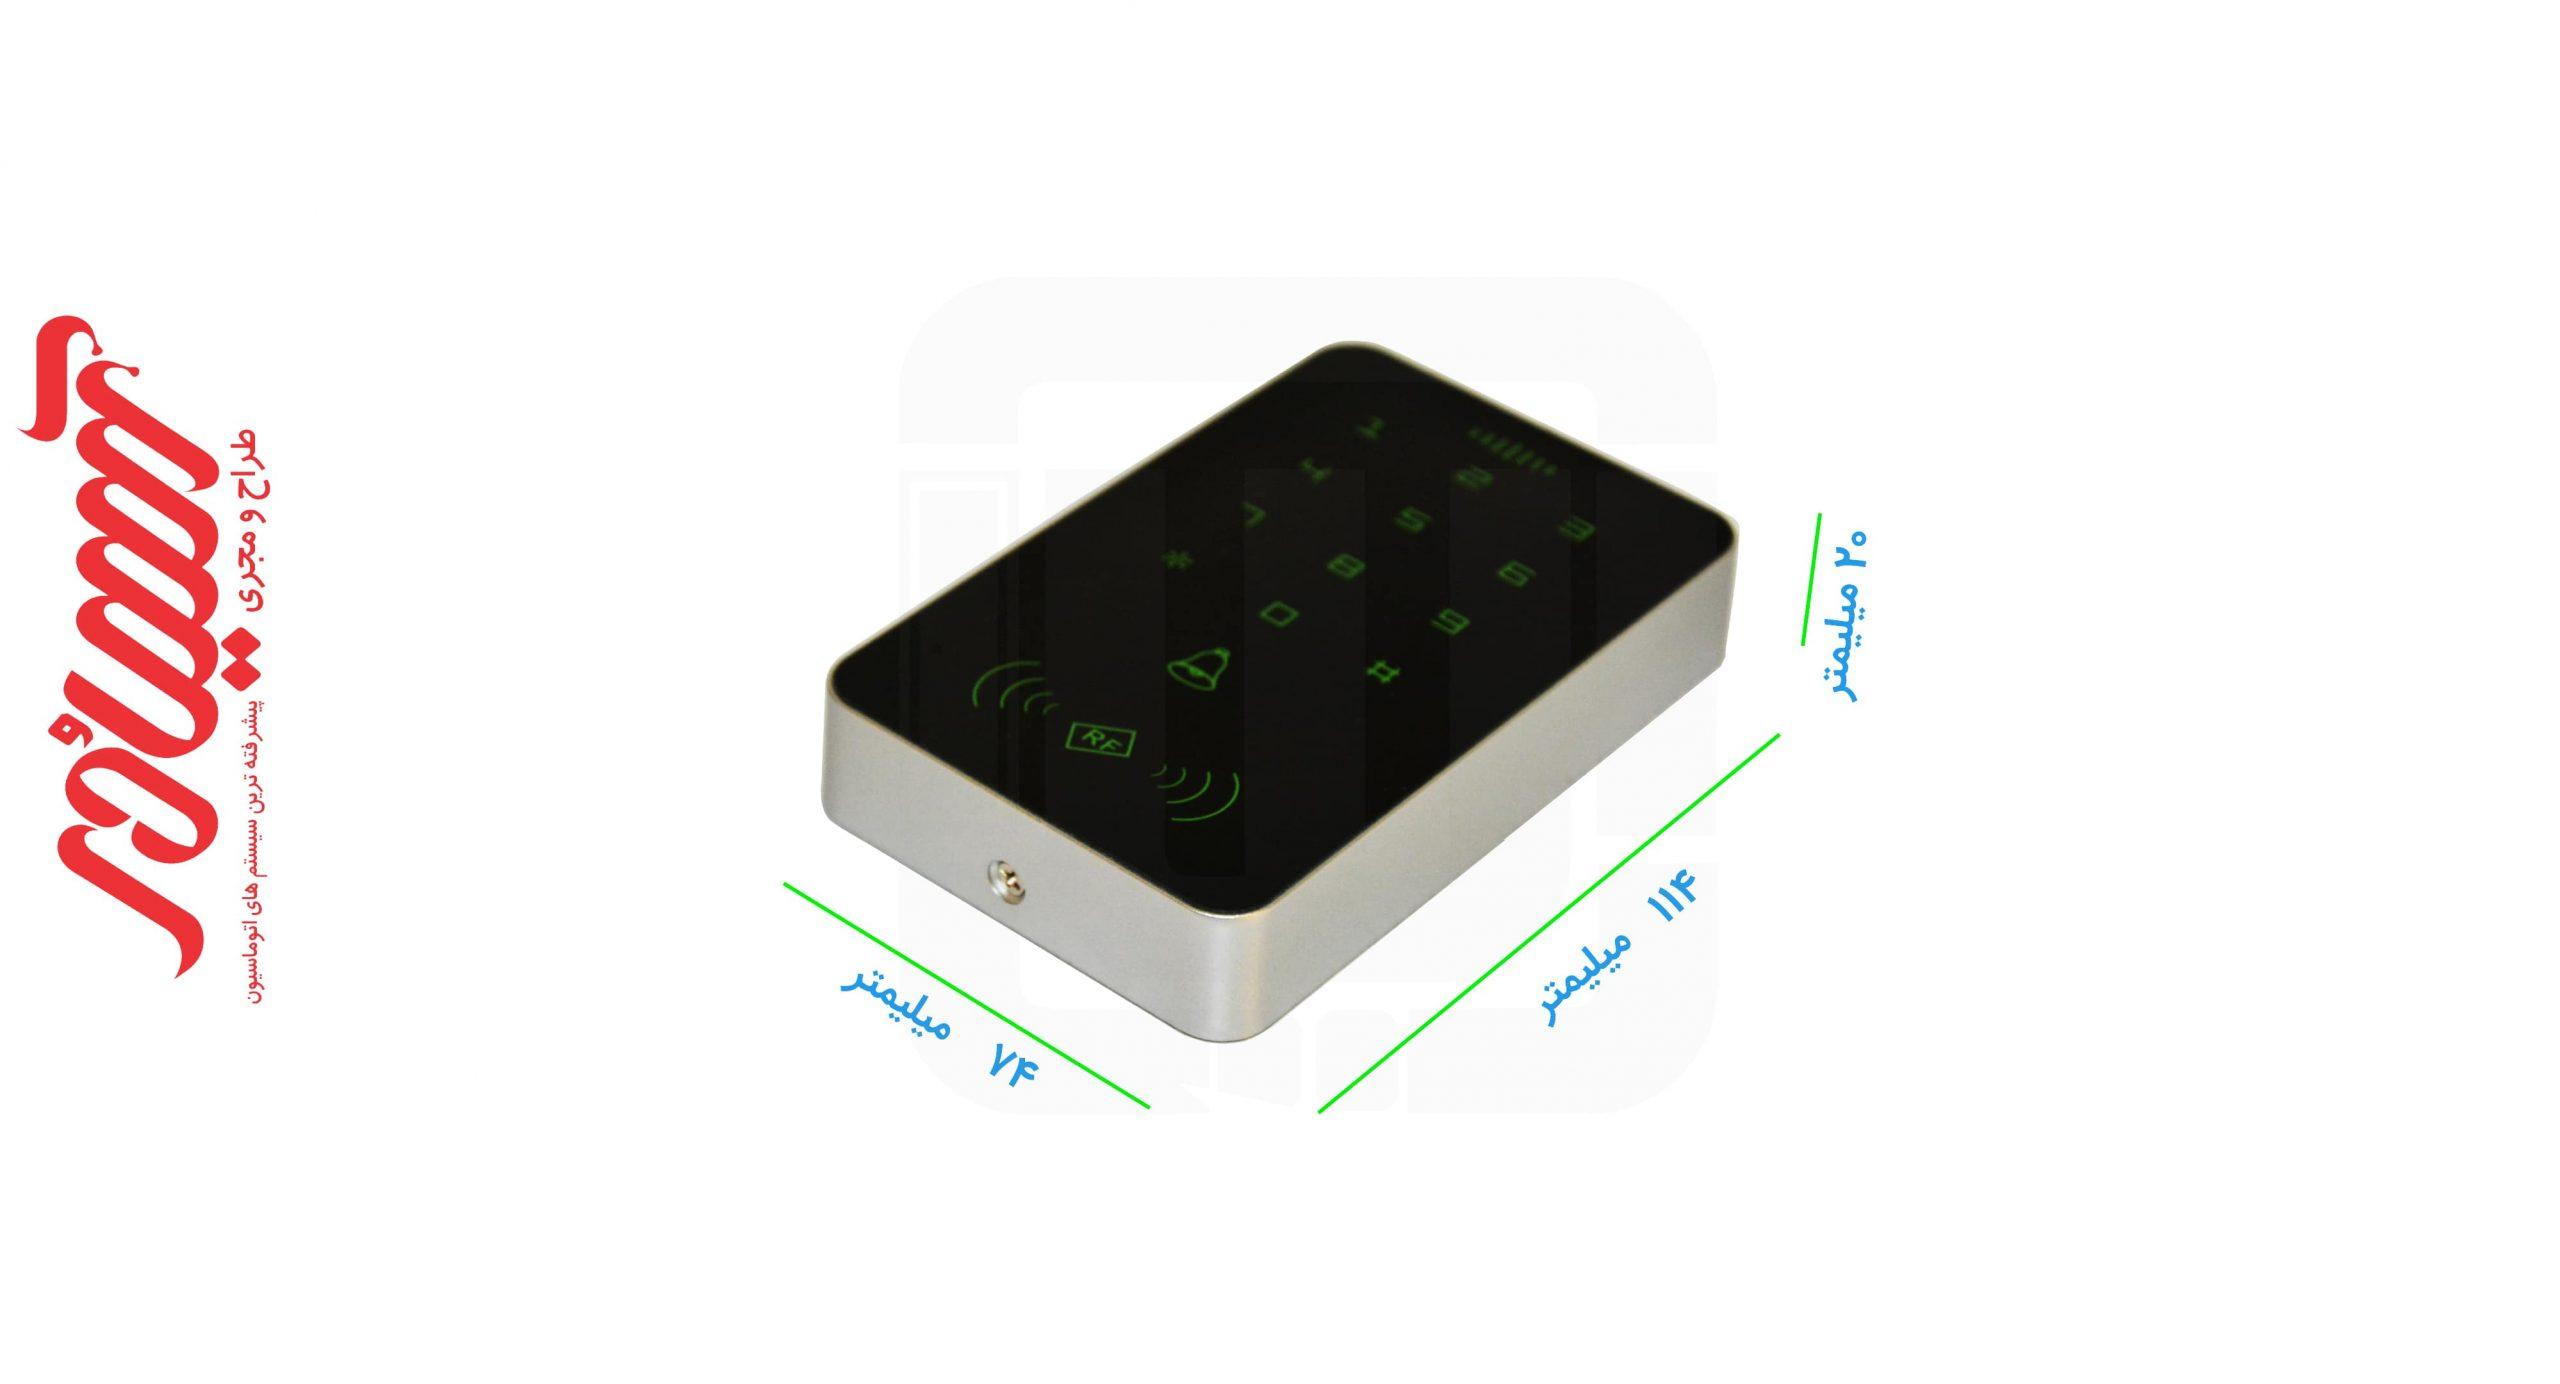 دستگاه اکسس کنترل HMT-ST65